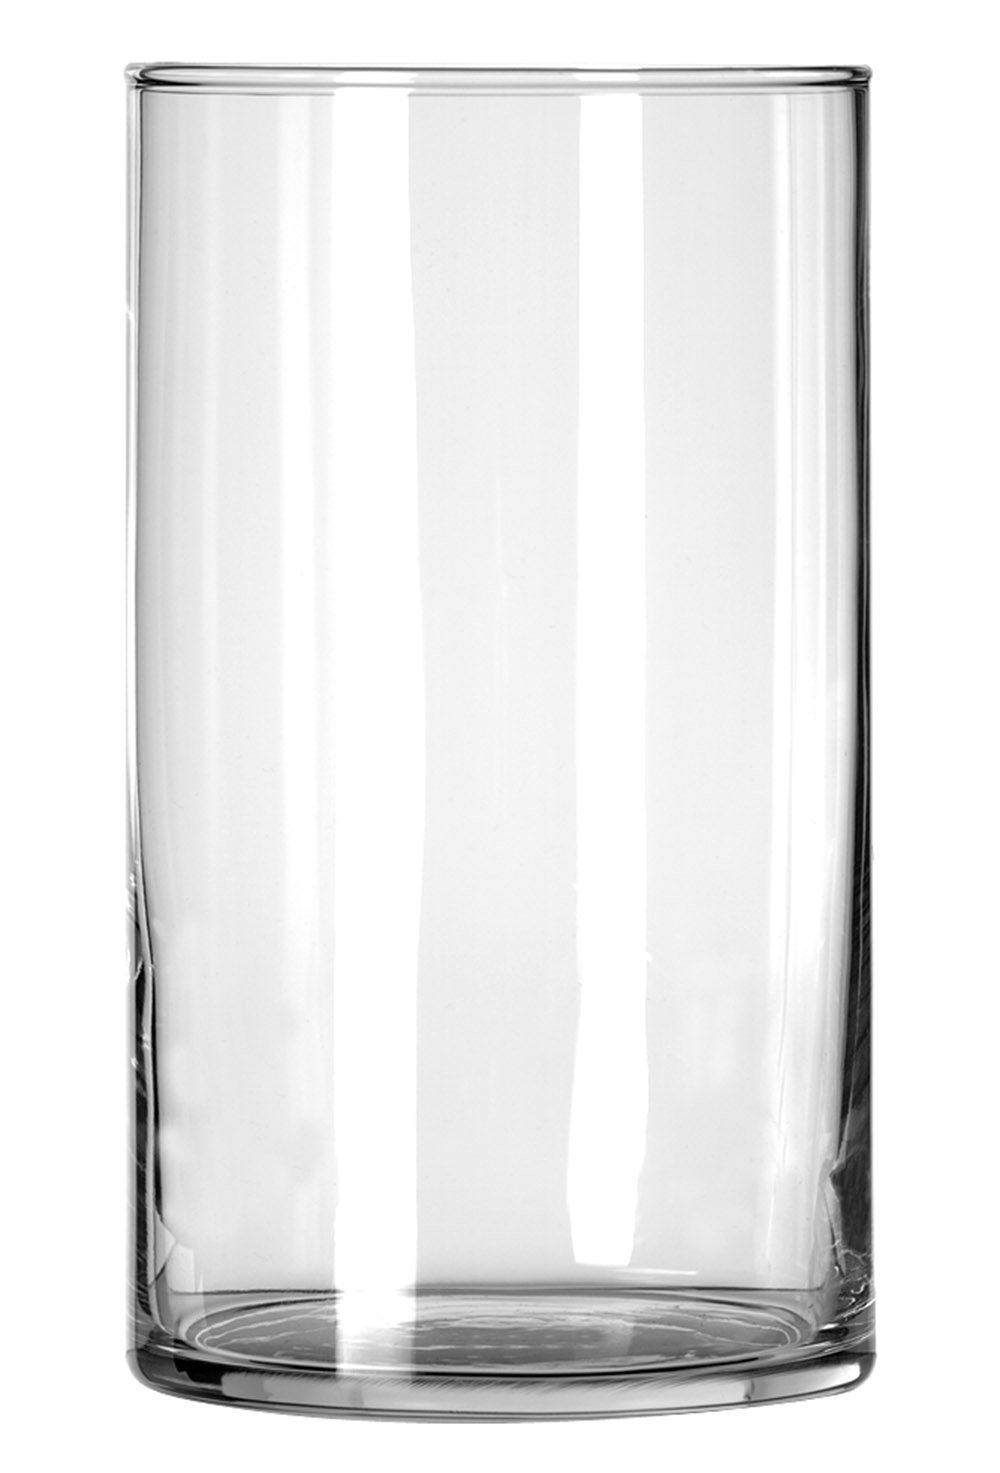 Libbey Cylinder Vase, 6-Inch, Clear, Set of 12